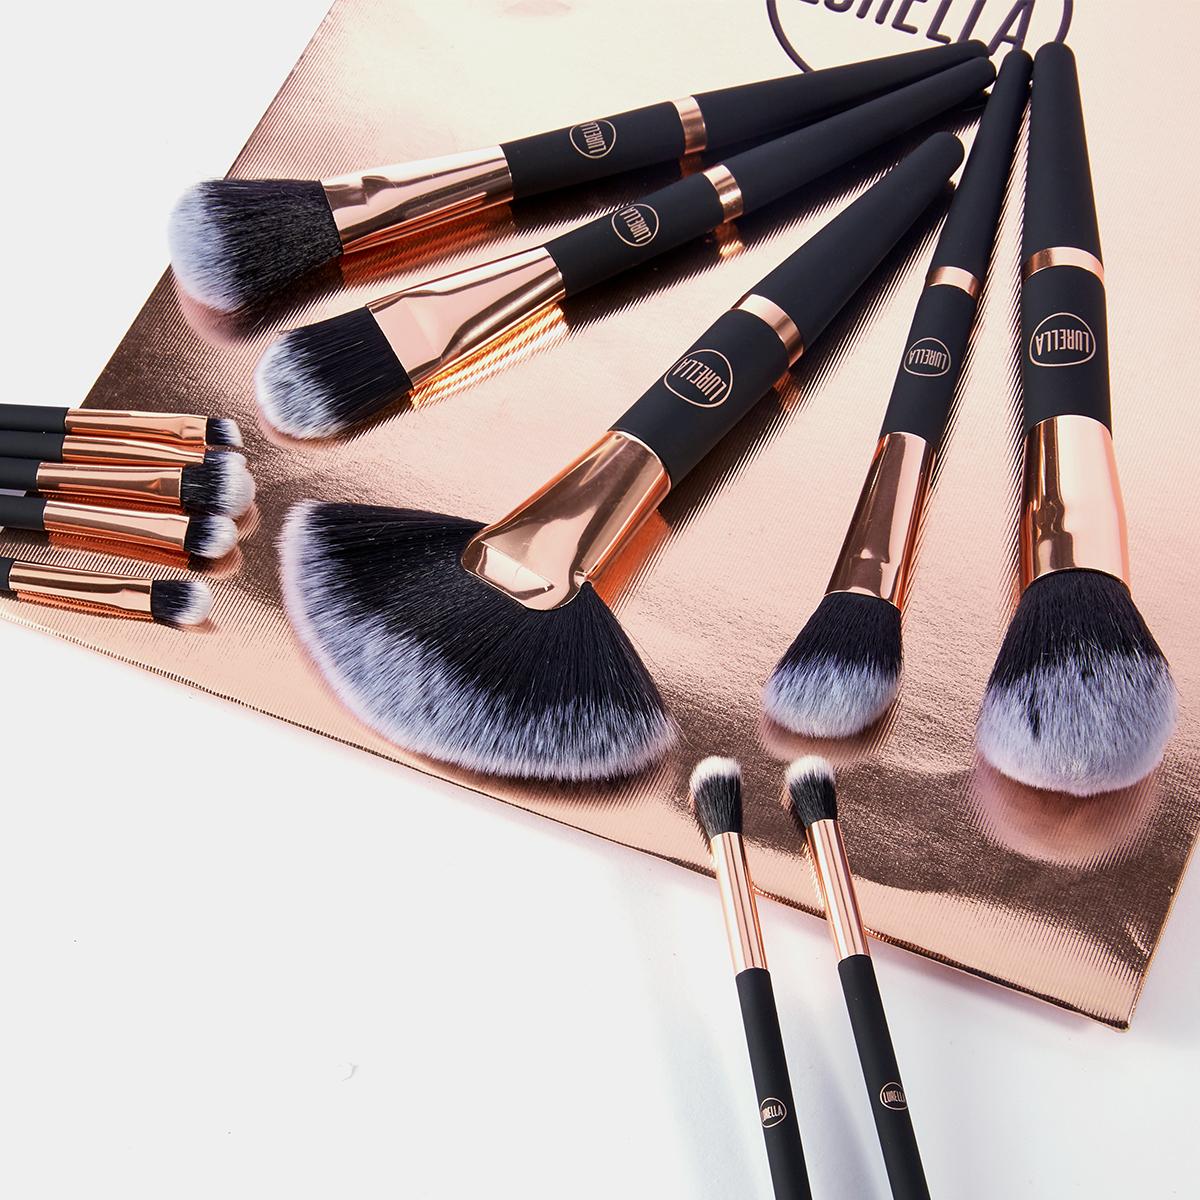 Lurella Cosmetics a ajuns și în România, pe www.ElisFashion.ro